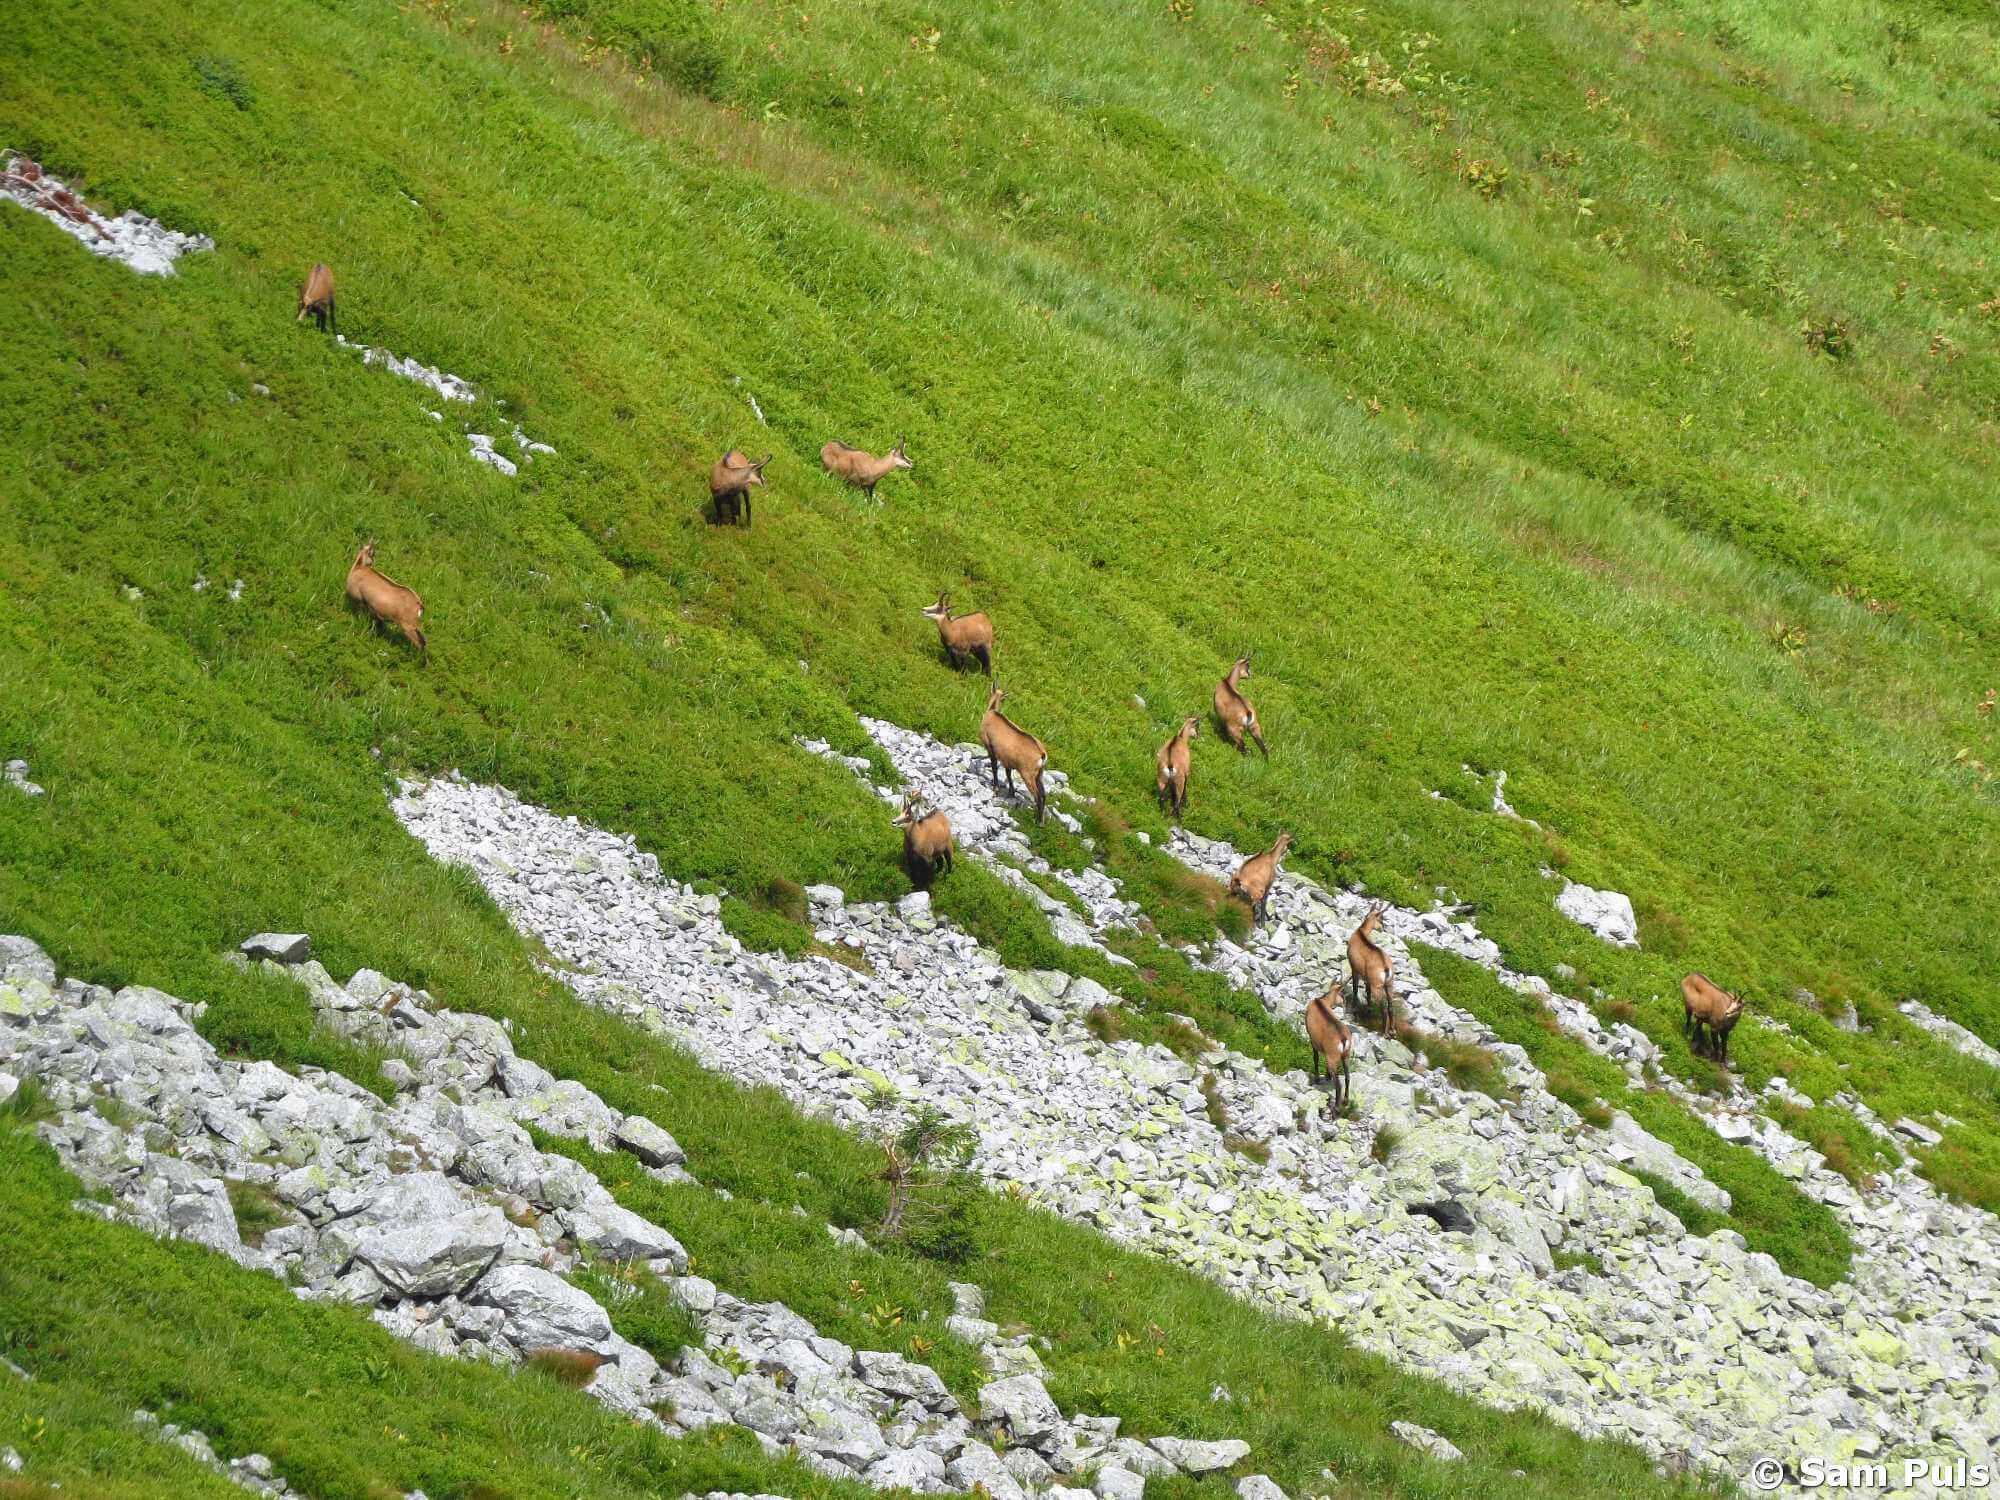 Tiere beobachten in der Hohen Tatra